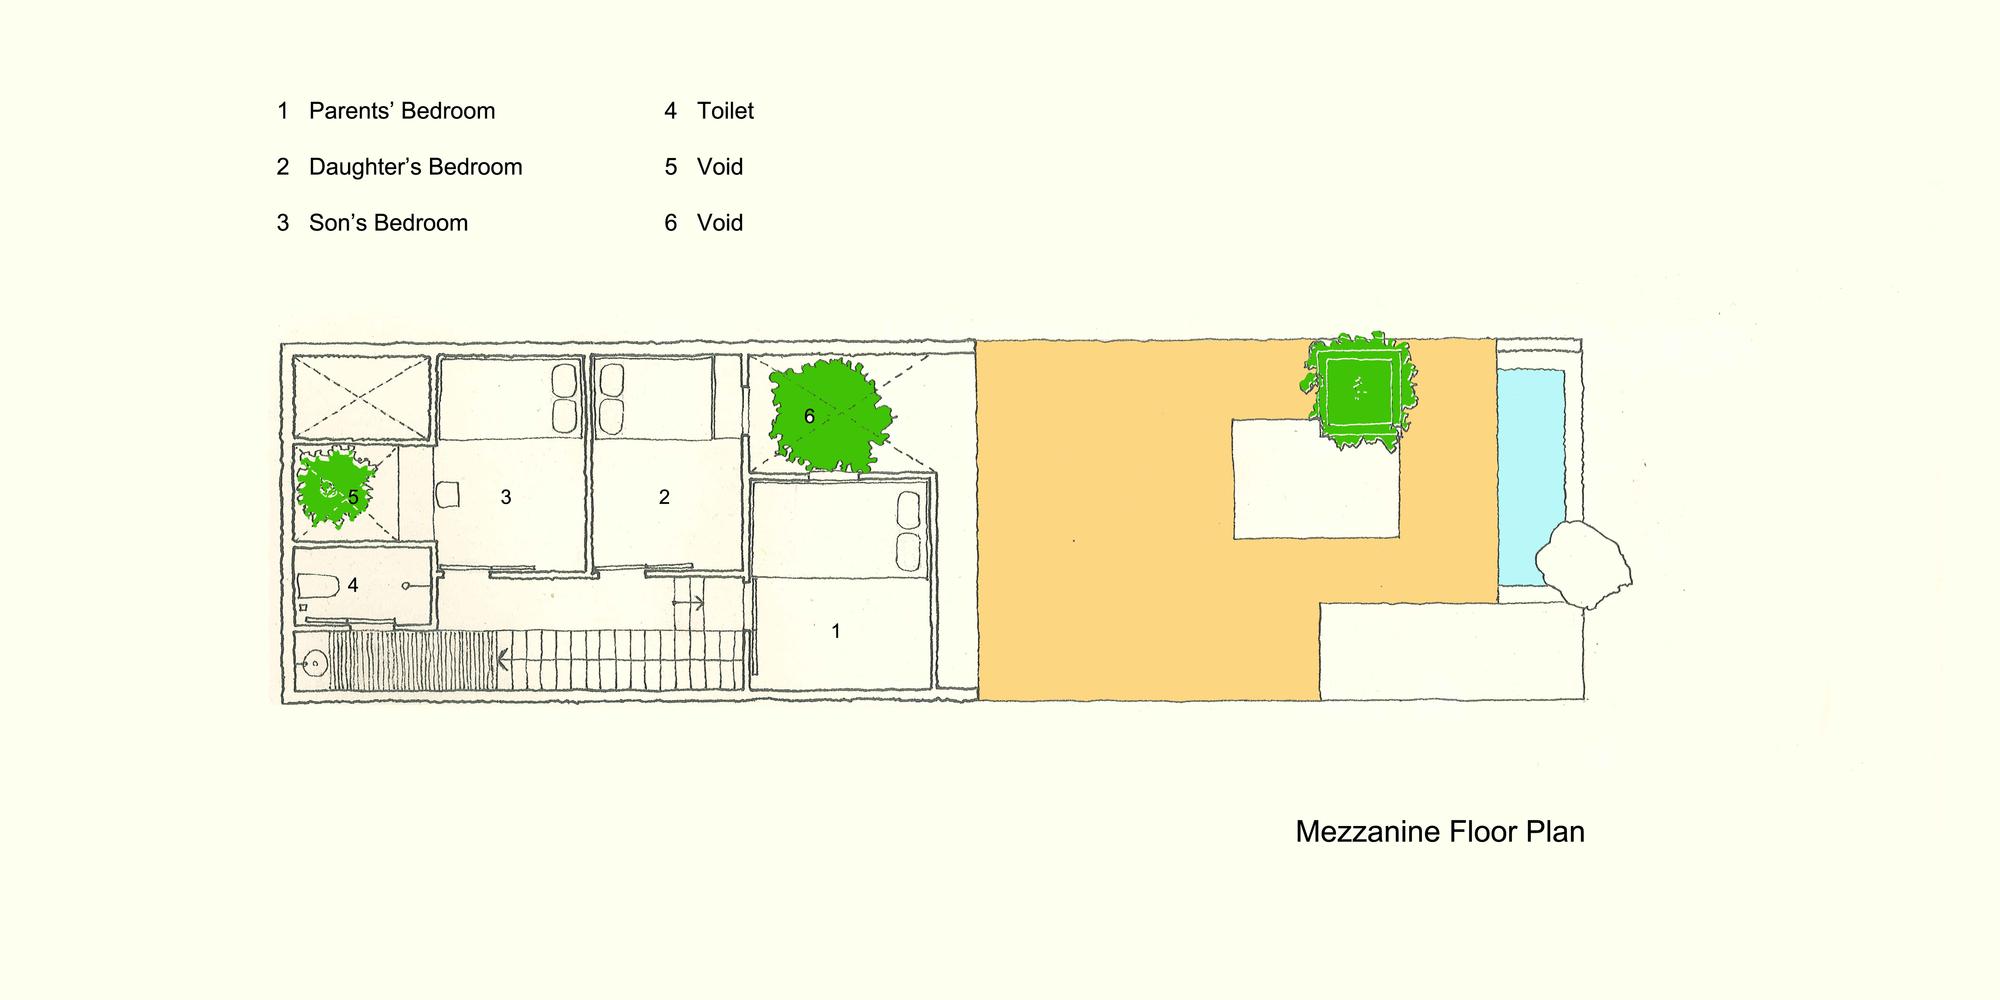 Uncle's House / 3 Atelier. 29 / 30. Mezzanine Floor Plan